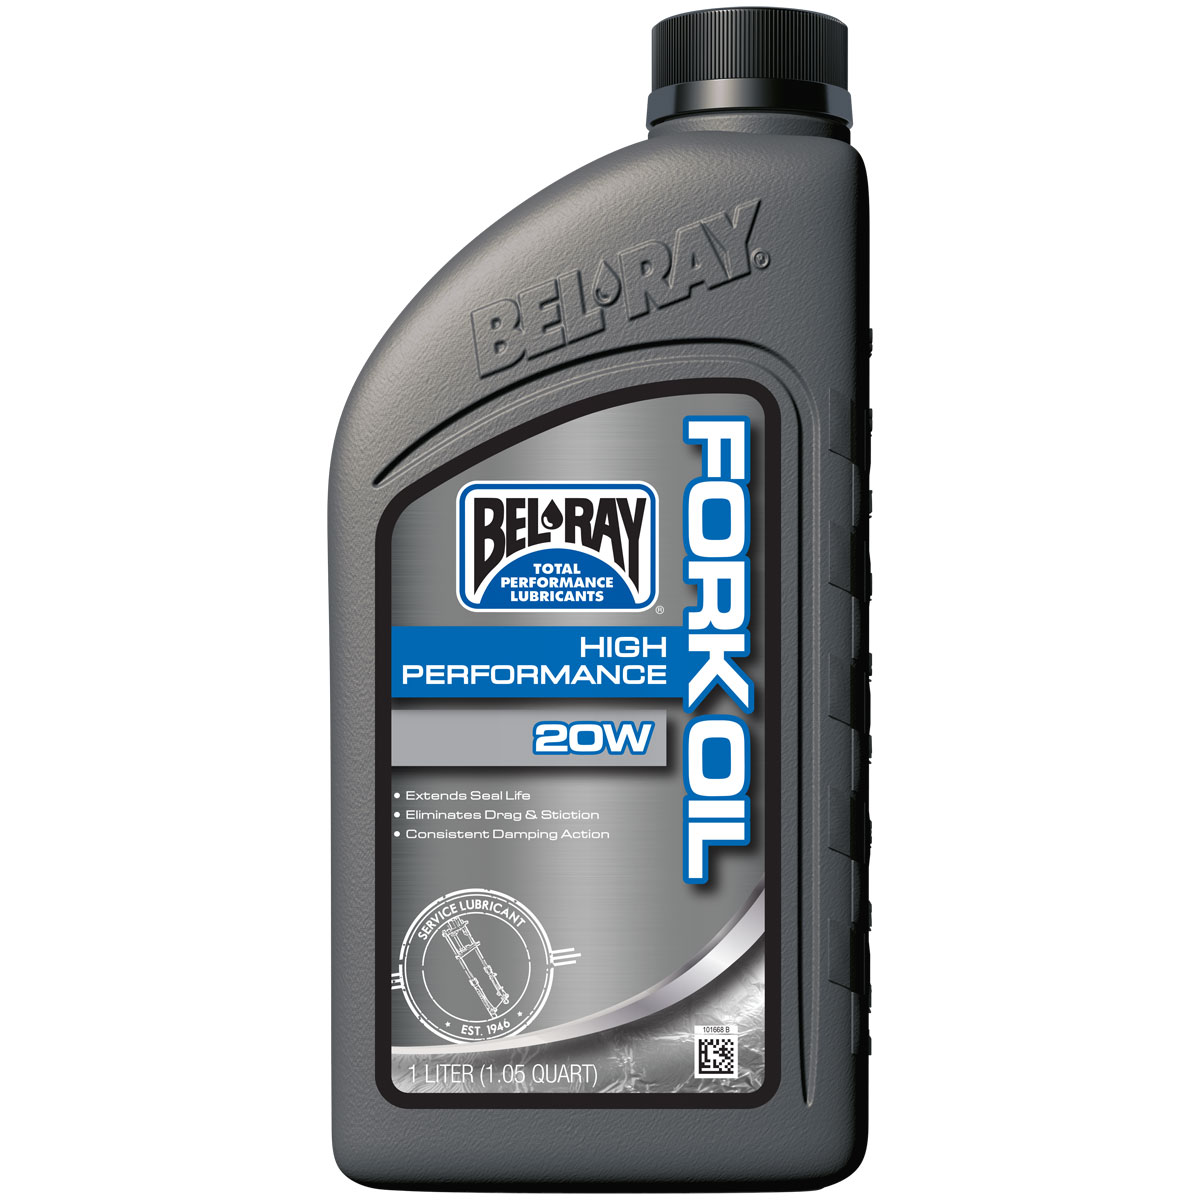 Bel-Ray 20W Fork Oil Liter